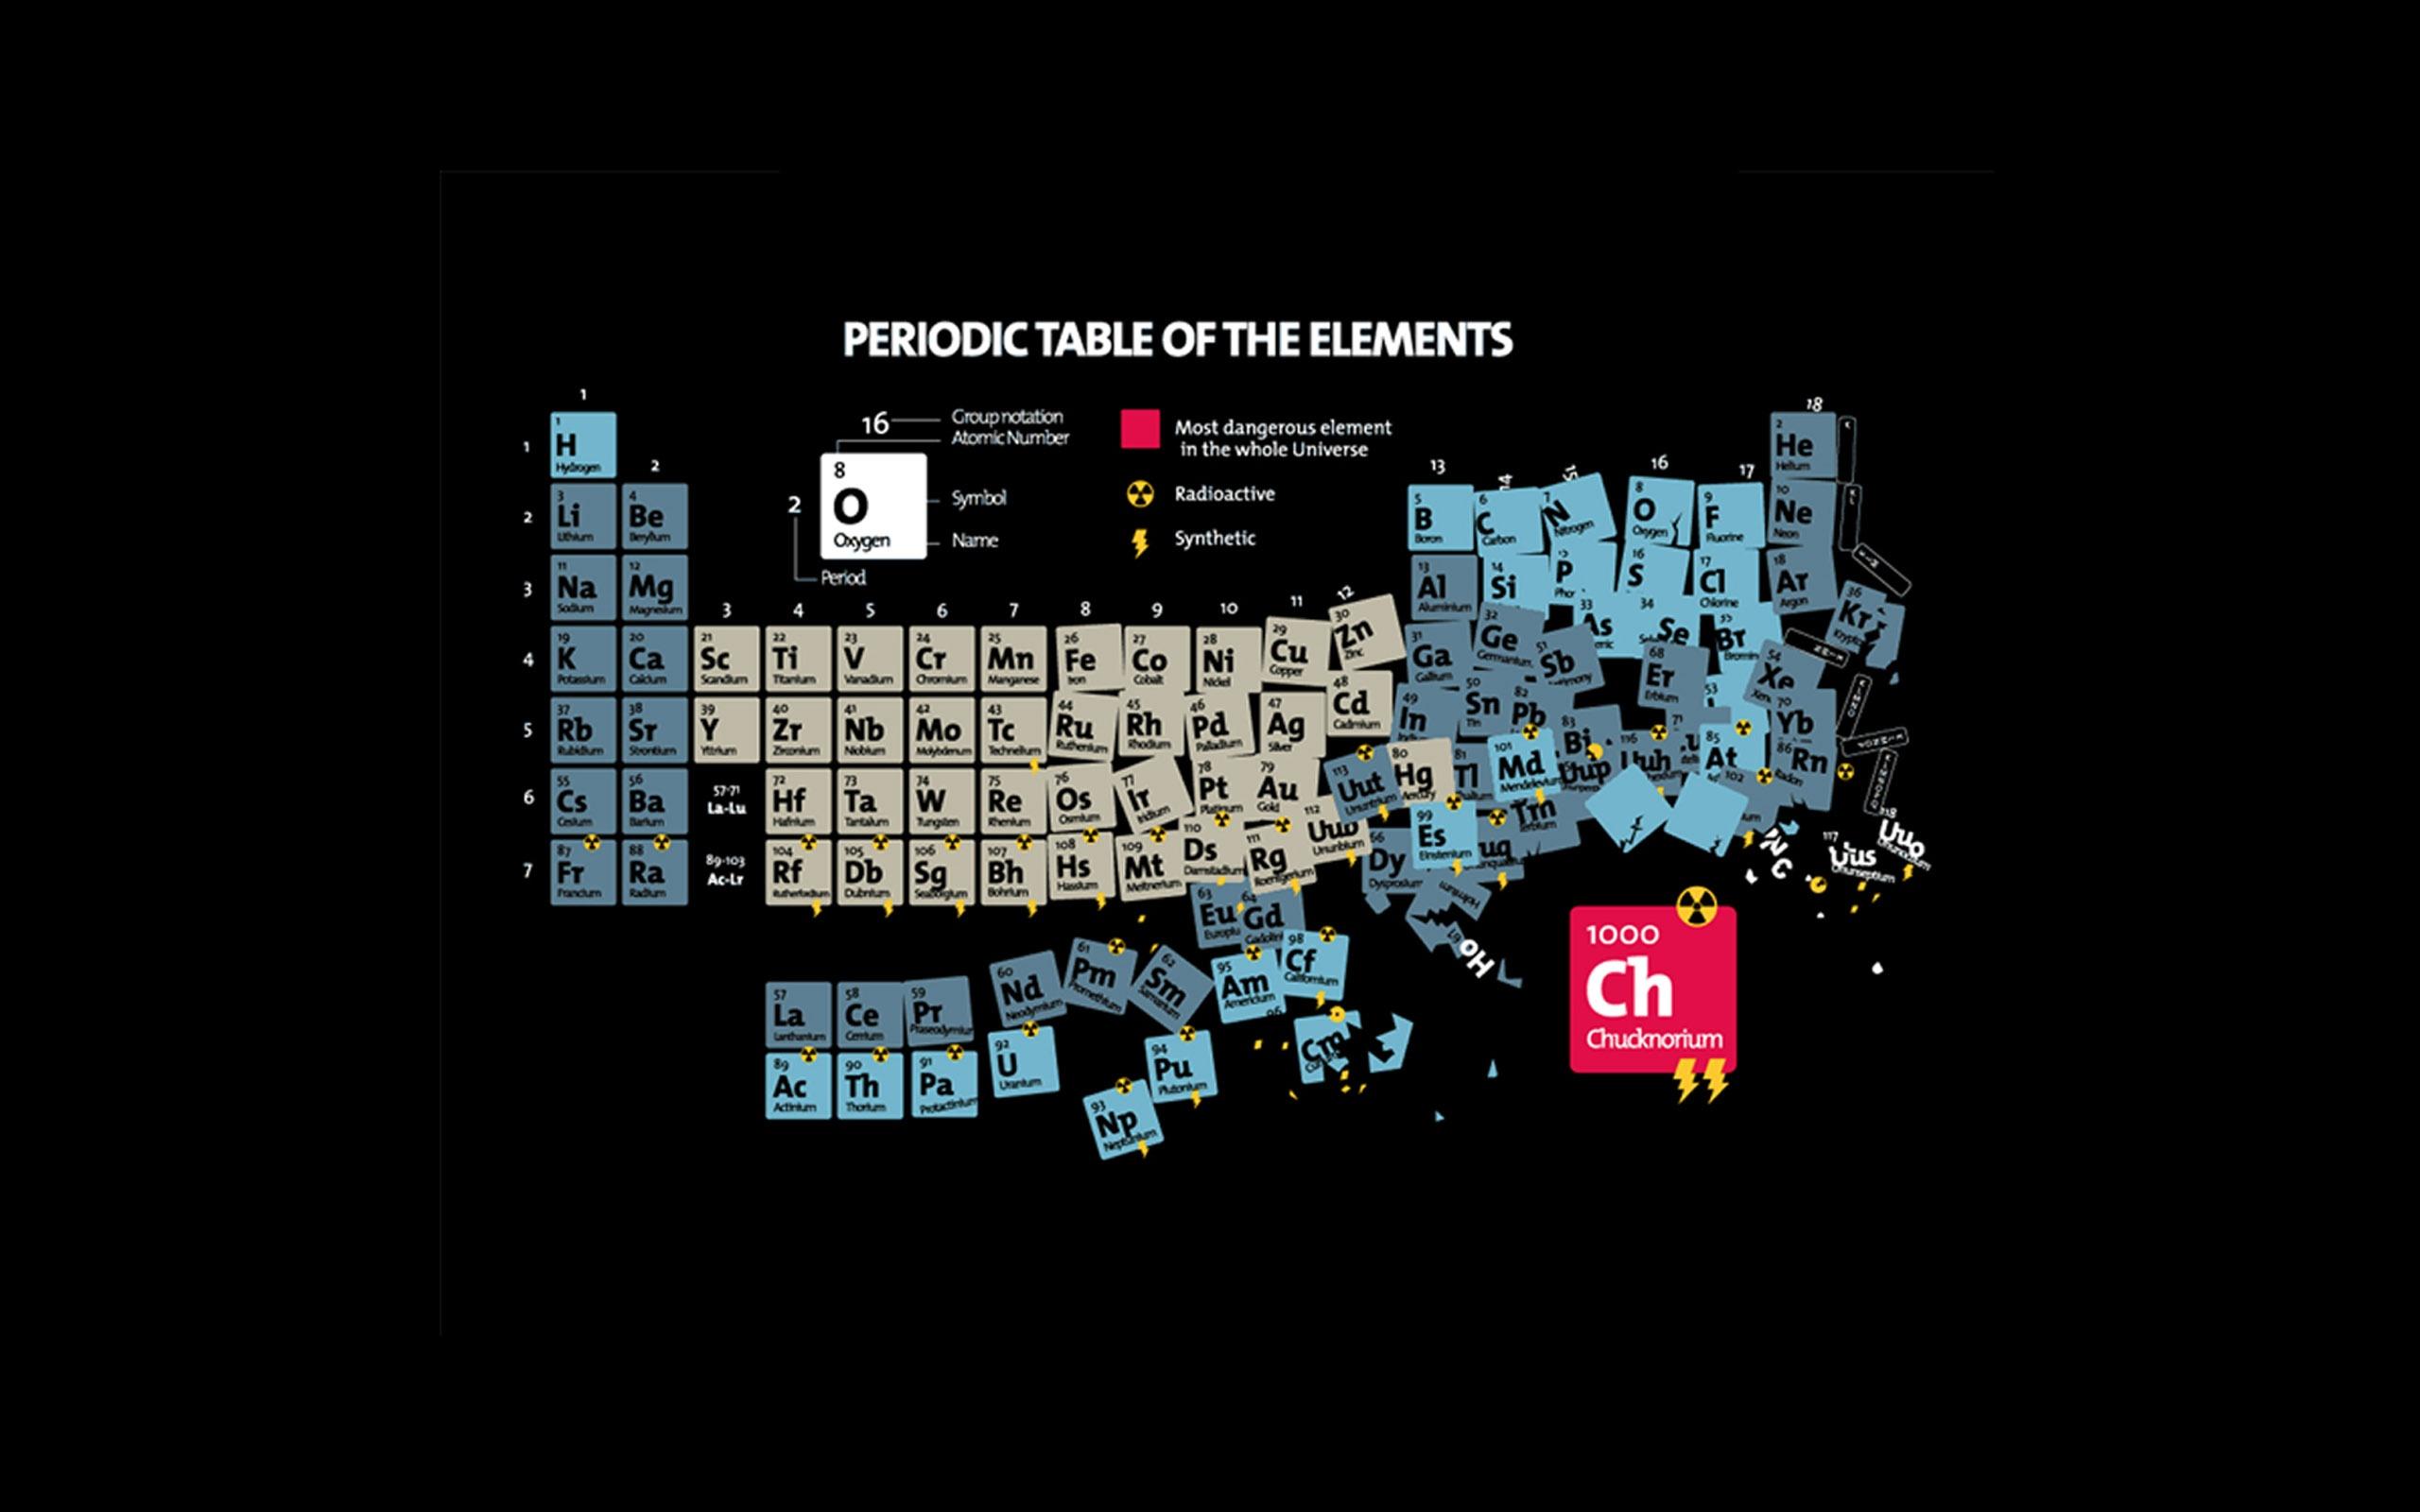 48+ Table of Elements Wallpaper on WallpaperSafari